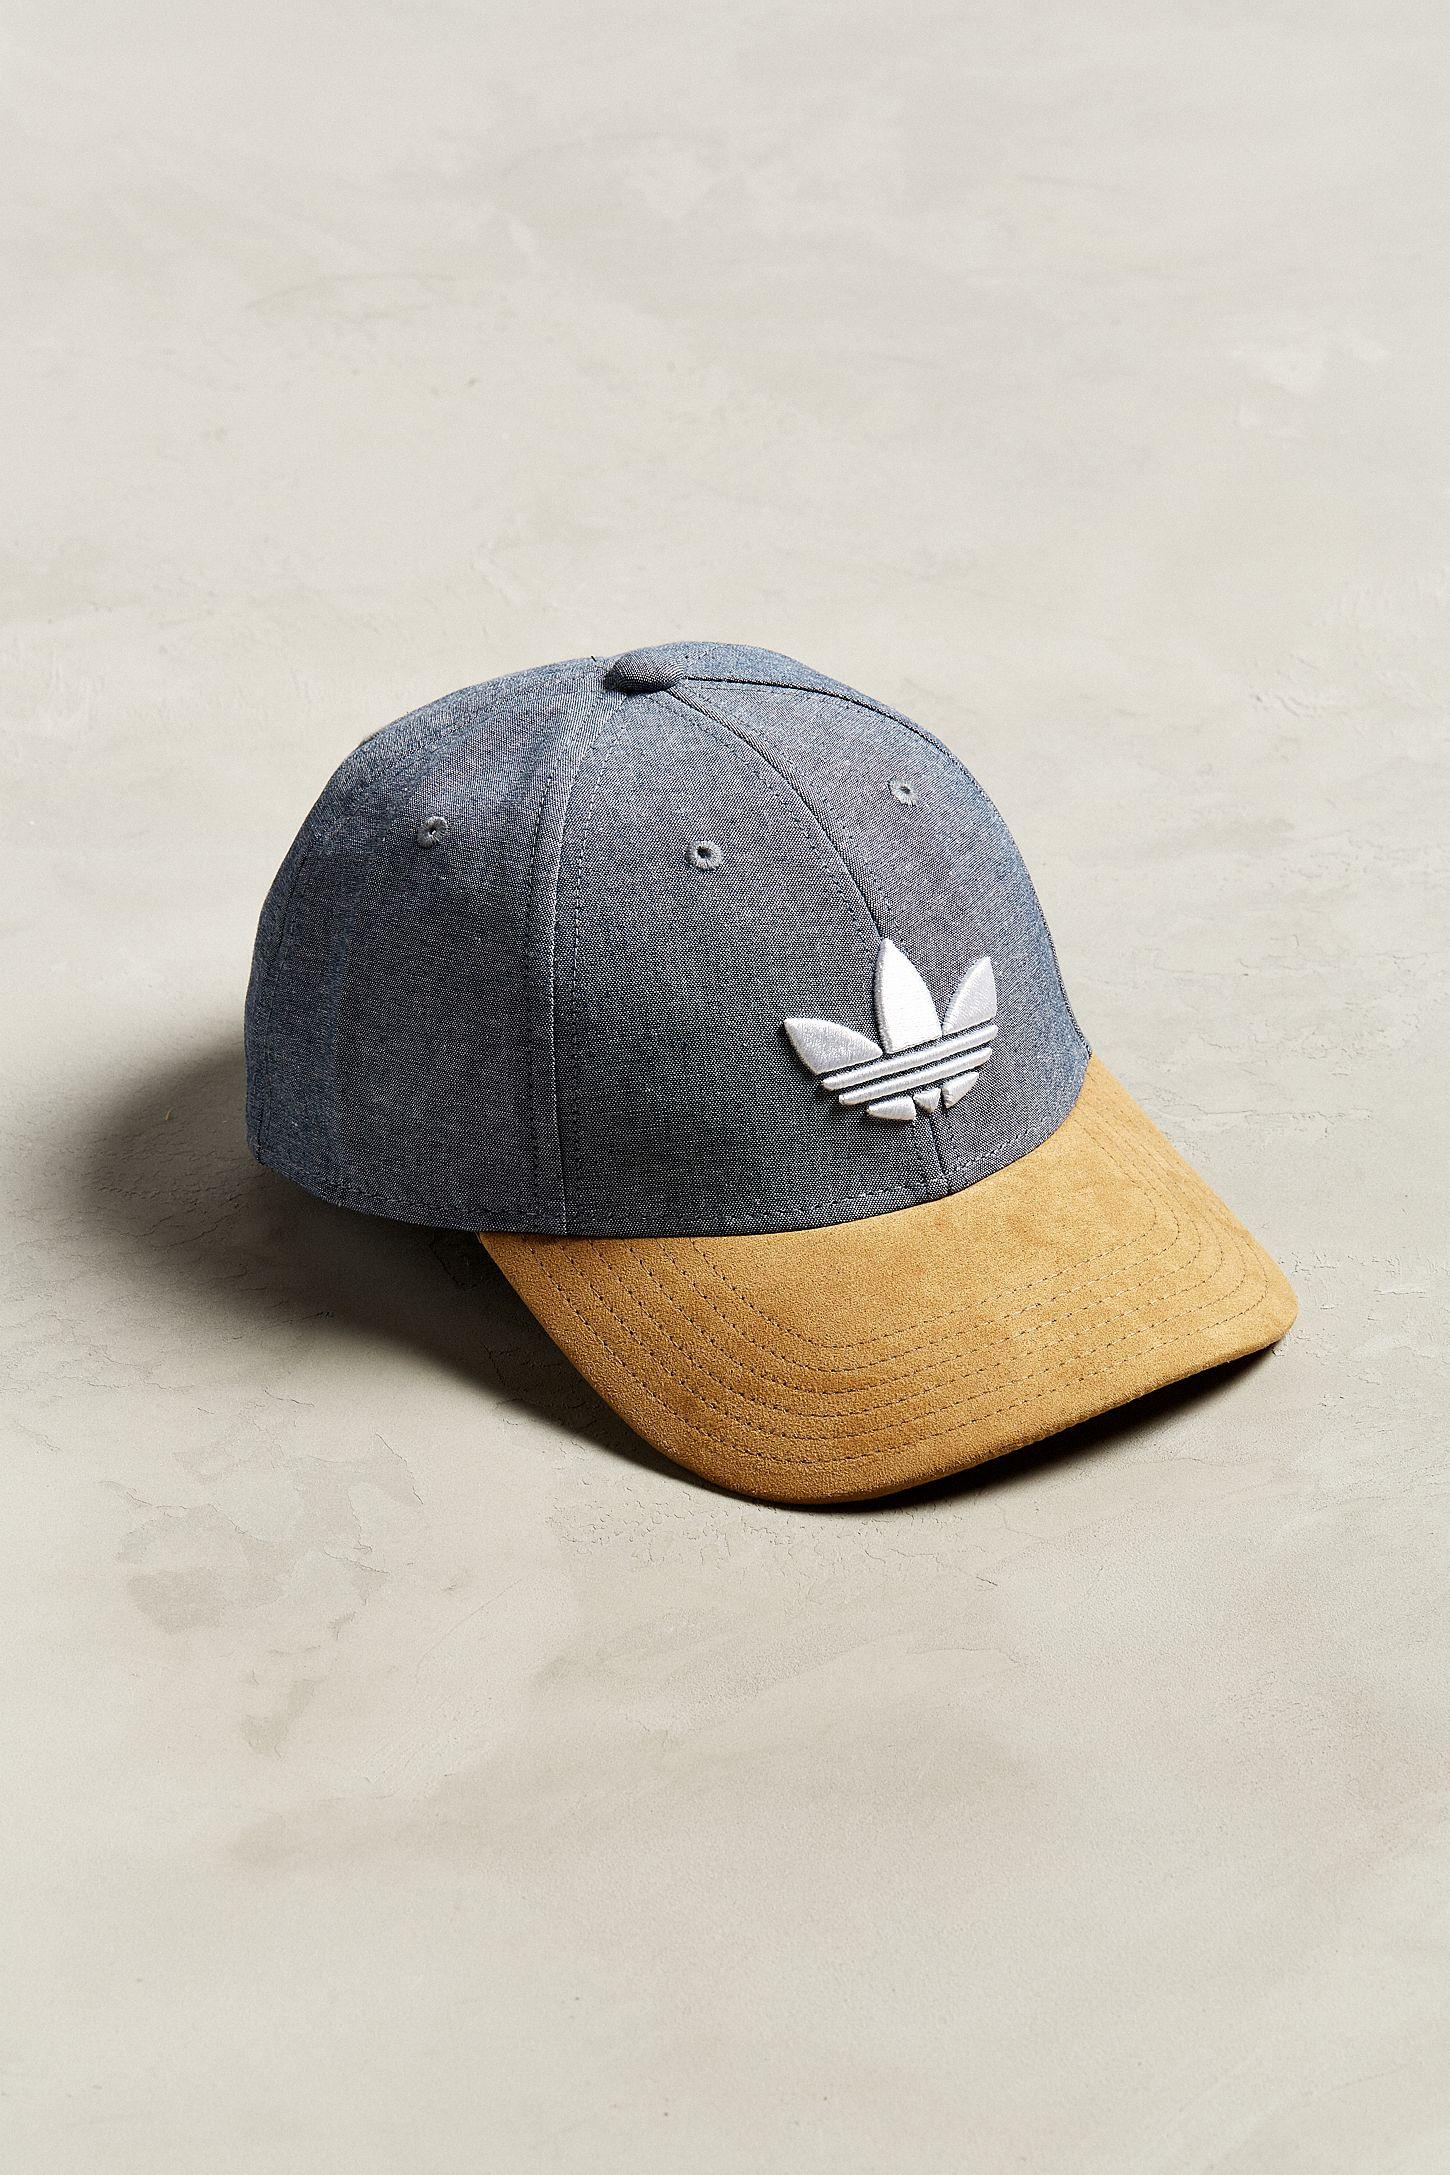 fa136b3e21432 adidas Originals Trefoil Plus Snapback Hat